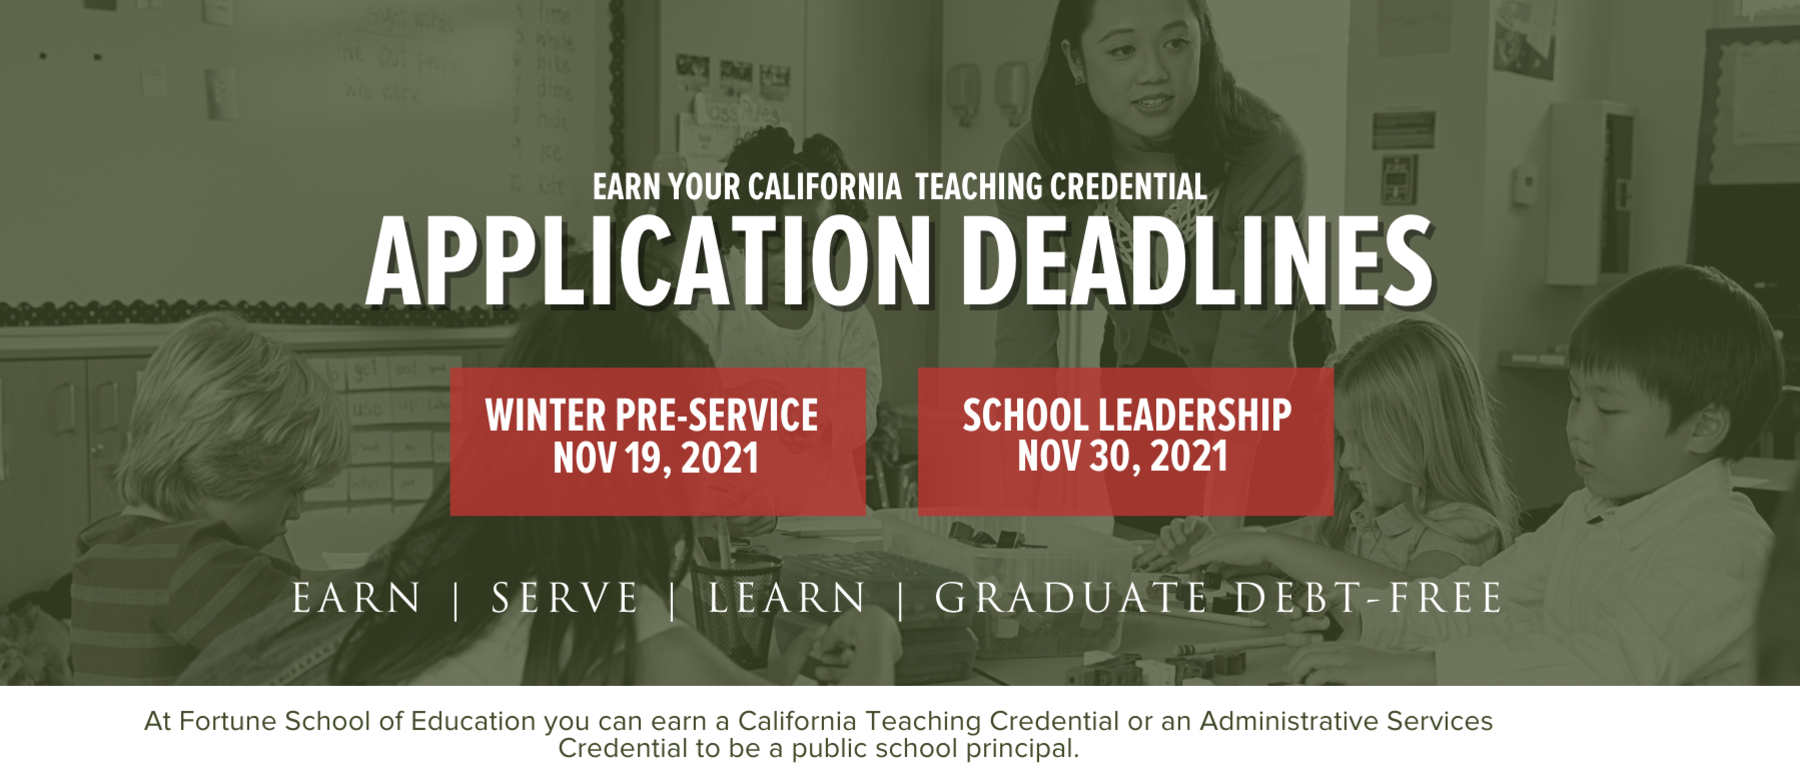 Application Deadlines: Winter Pre-Service 11/19/21 and School Leadership 11/30/21